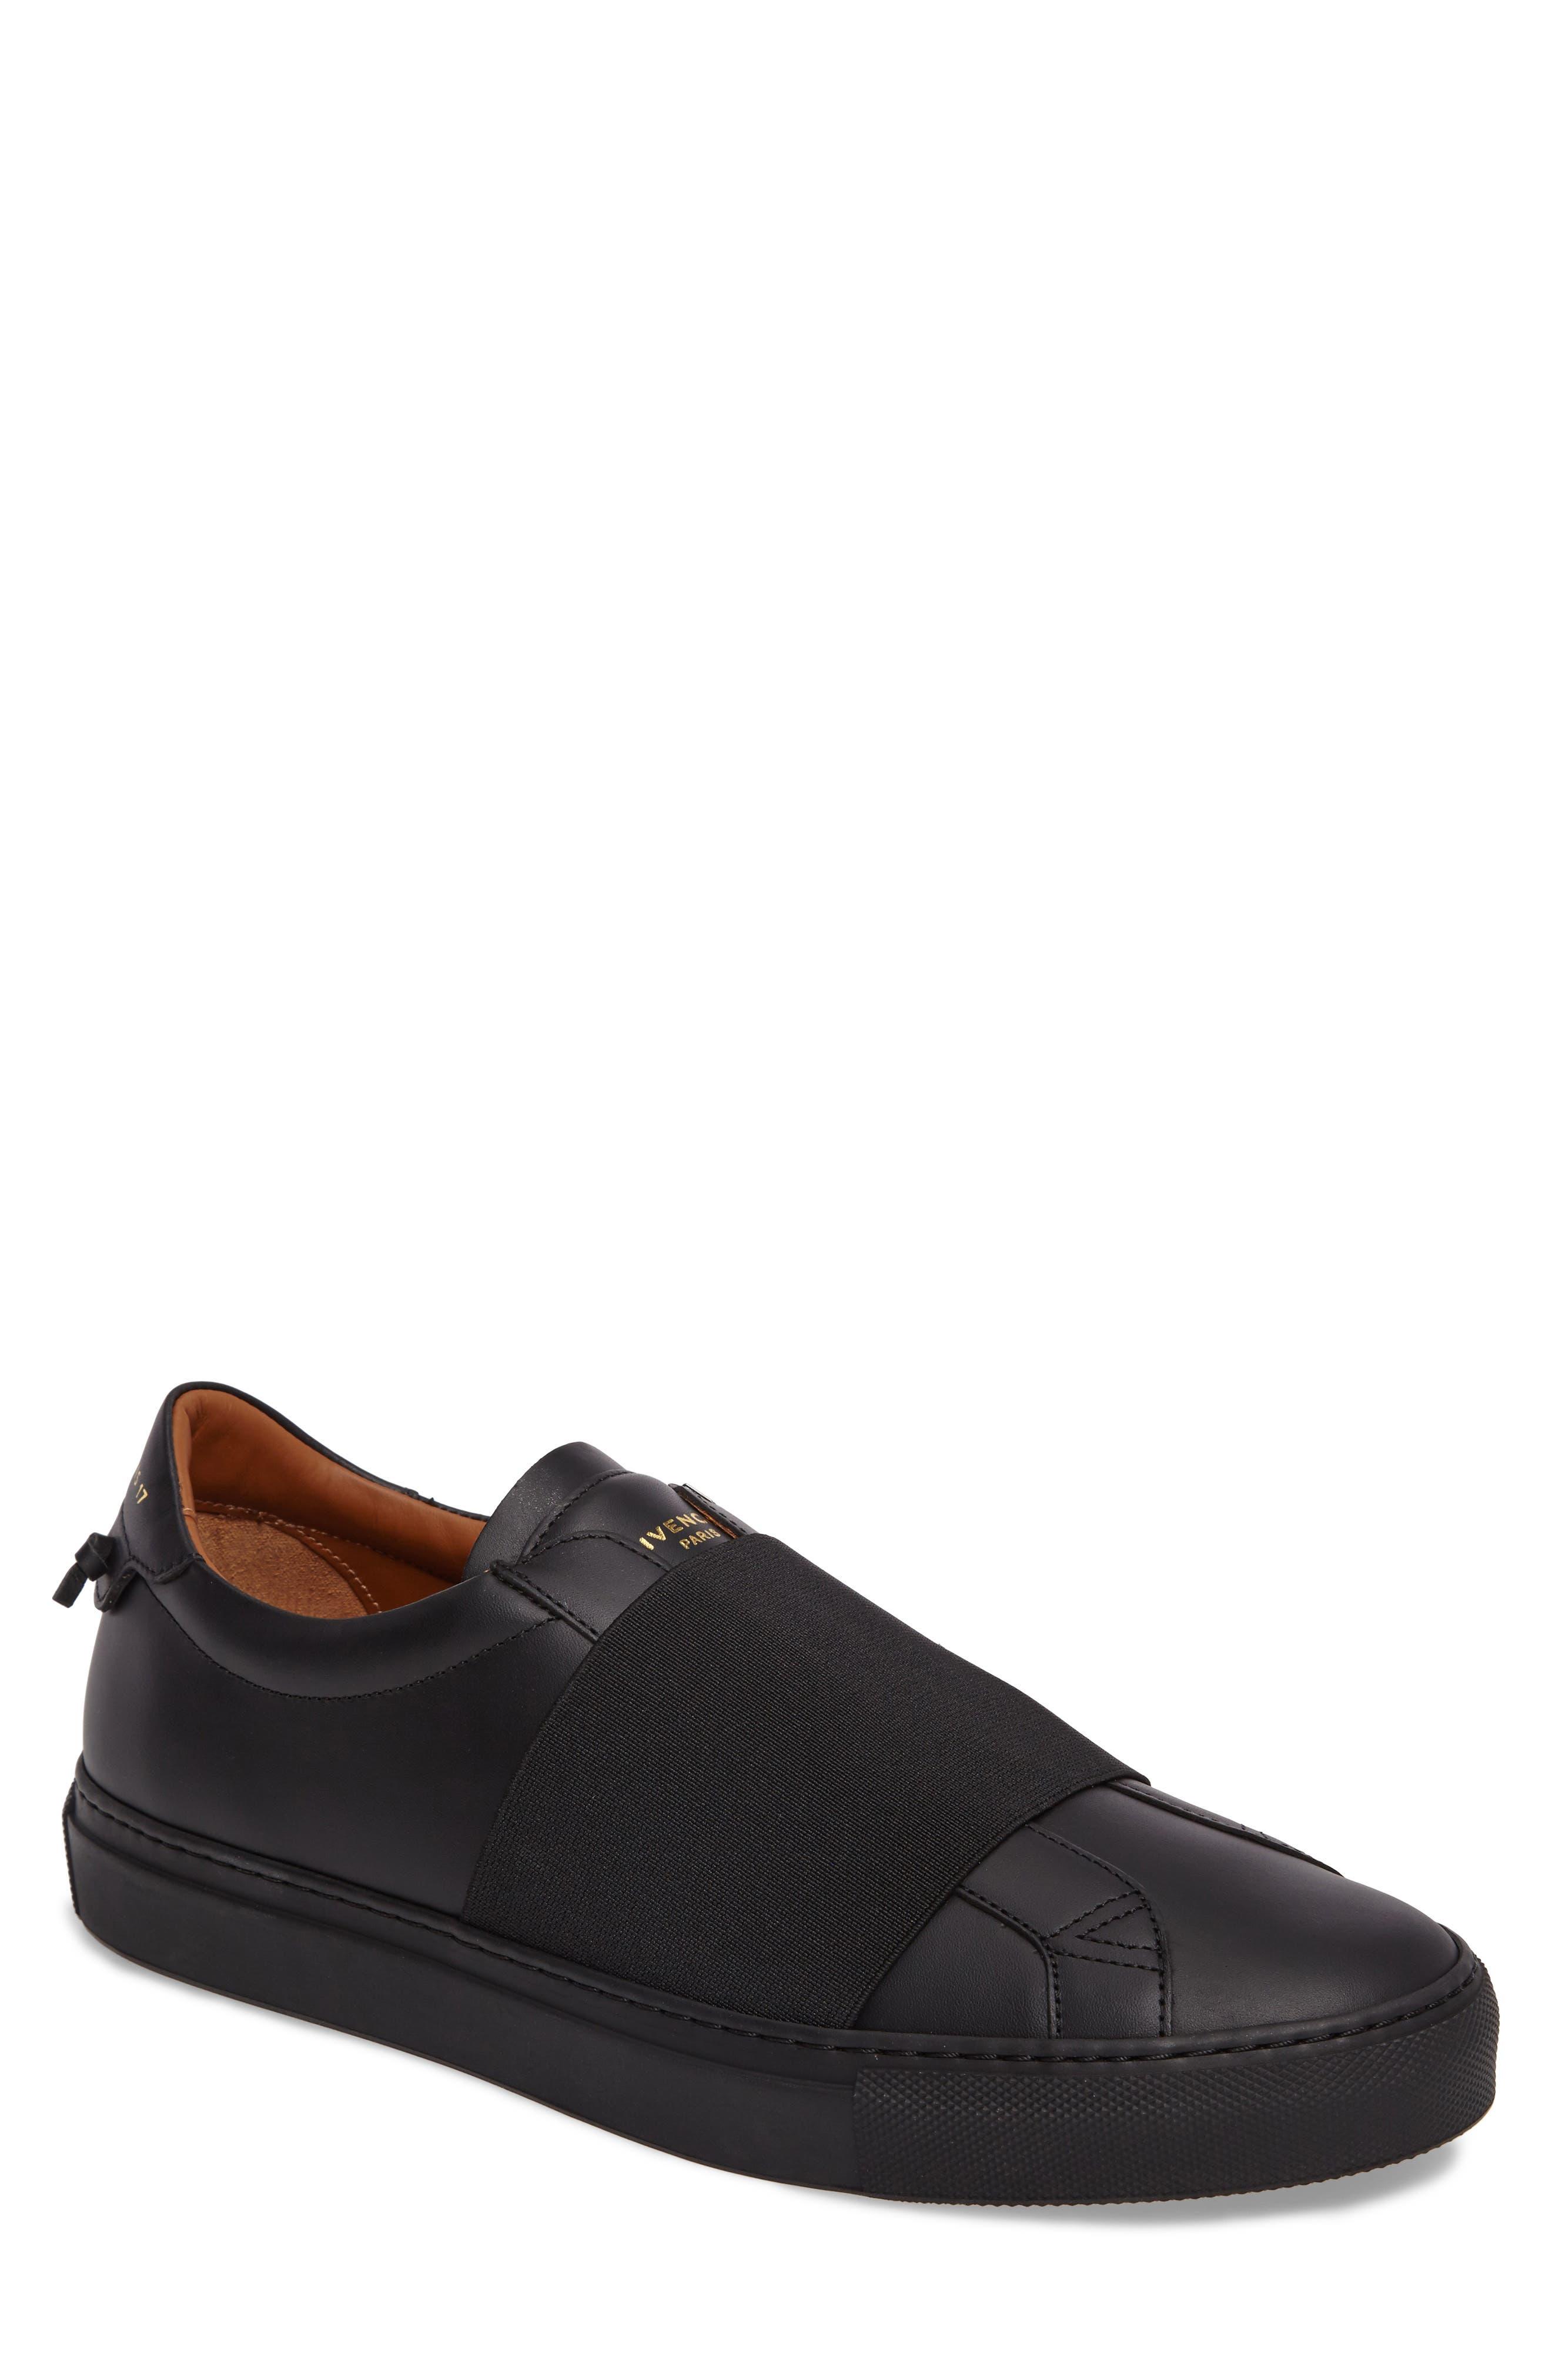 Main Image - Givenchy Slip-On Sneaker (Men)